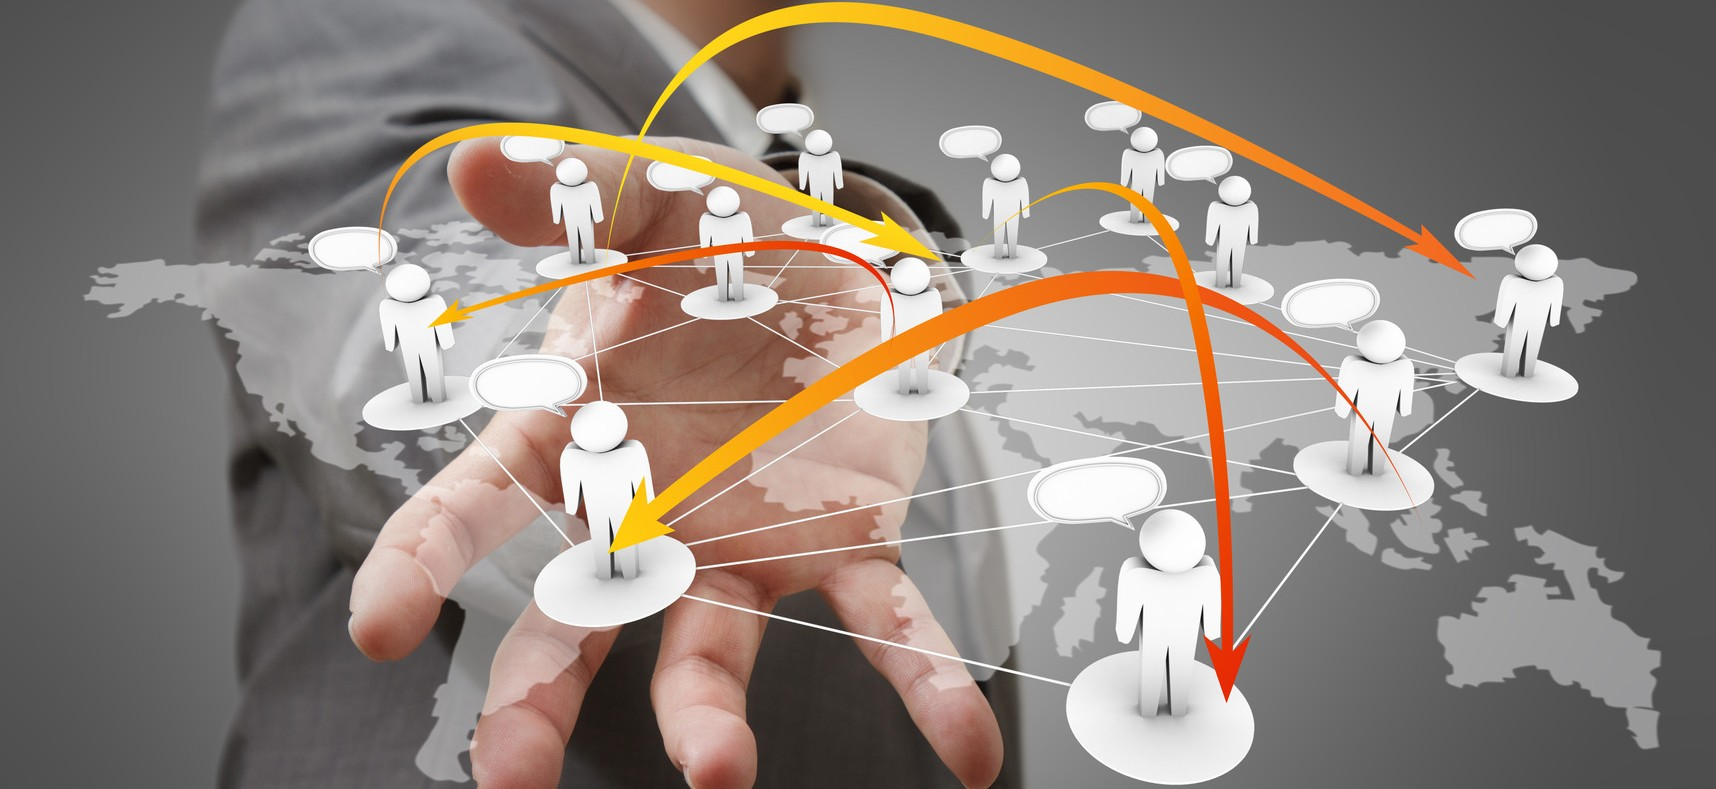 photodune-1118912-businessman-hand-holds-social-network-m-e1427402672138